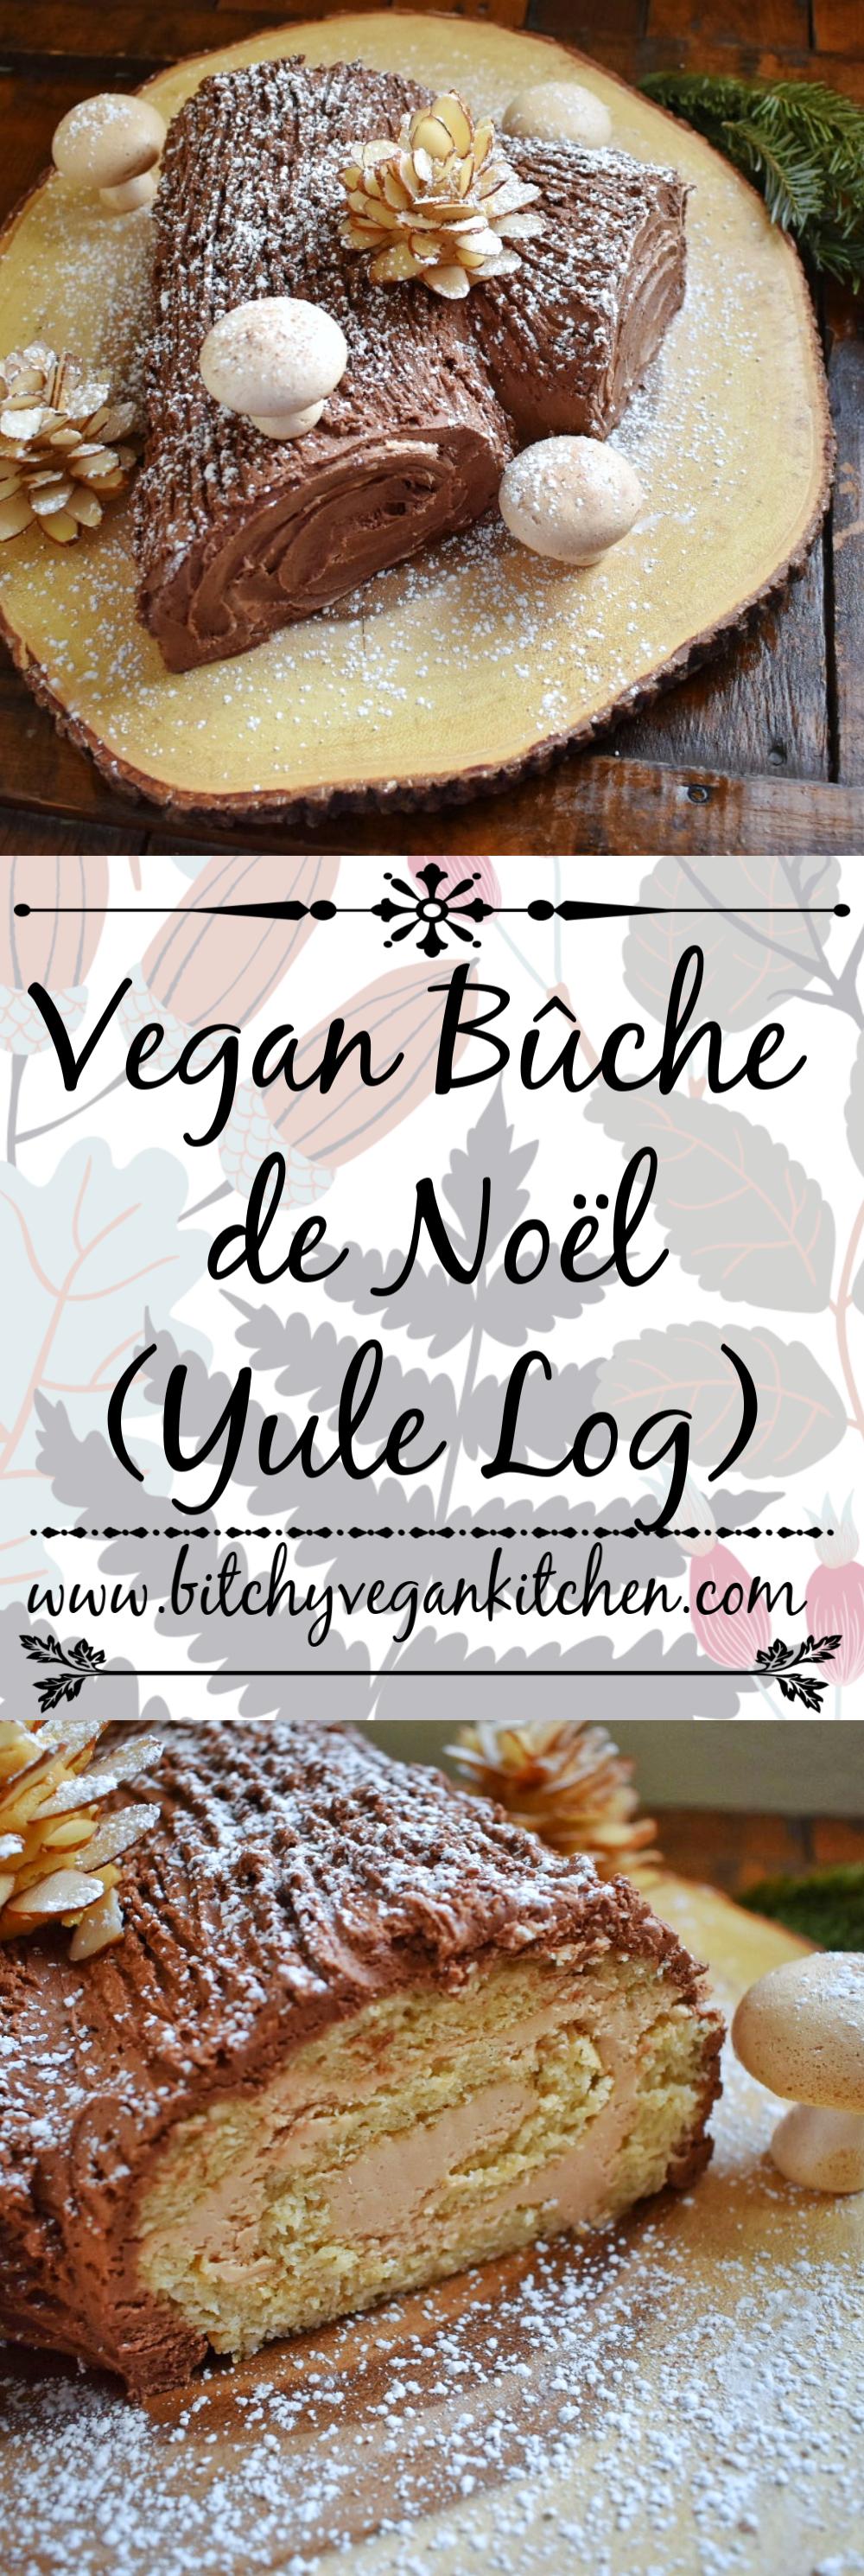 Vegan Bûche de Noël - The Bitchy Baker